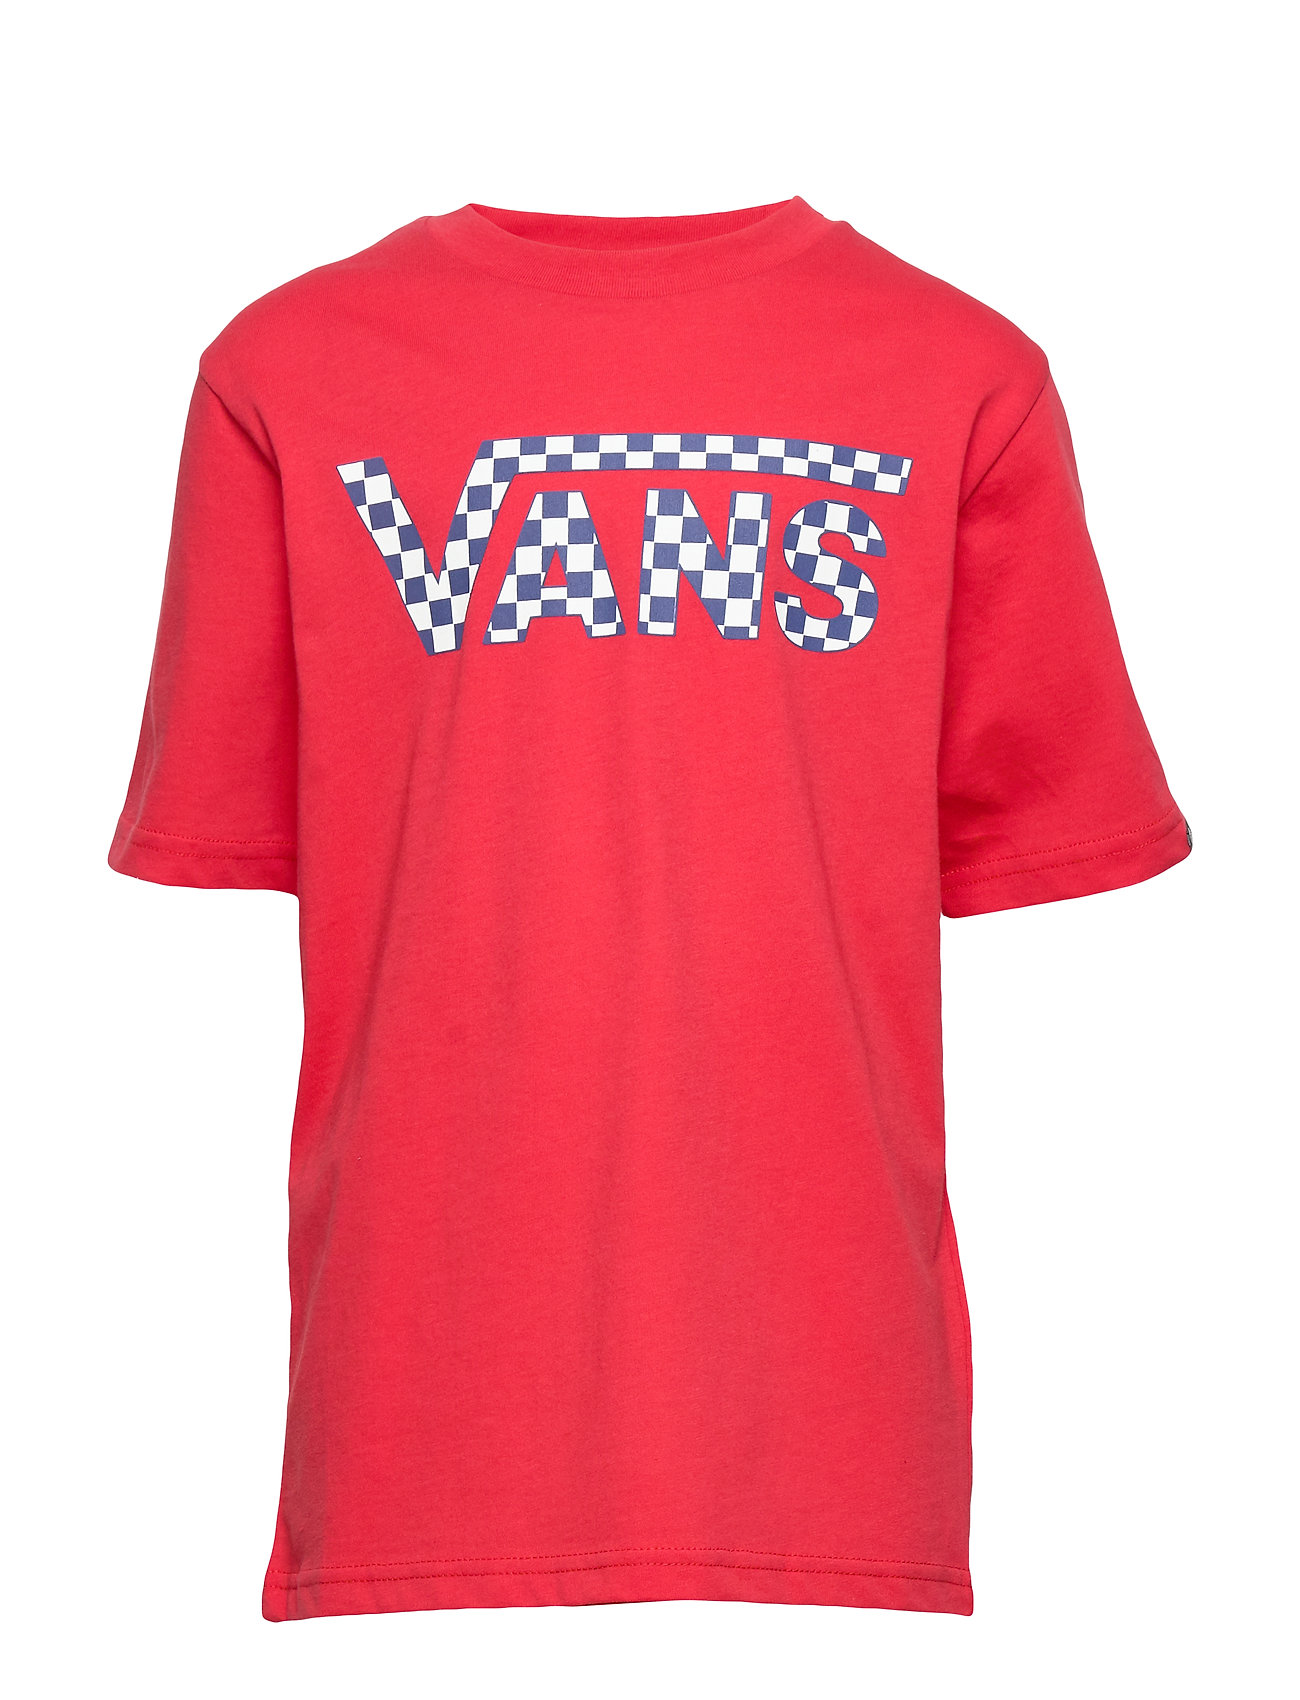 VANS VANS CLASSIC LOGO FILL BOYS - RACING RED/CHECKERBOARD